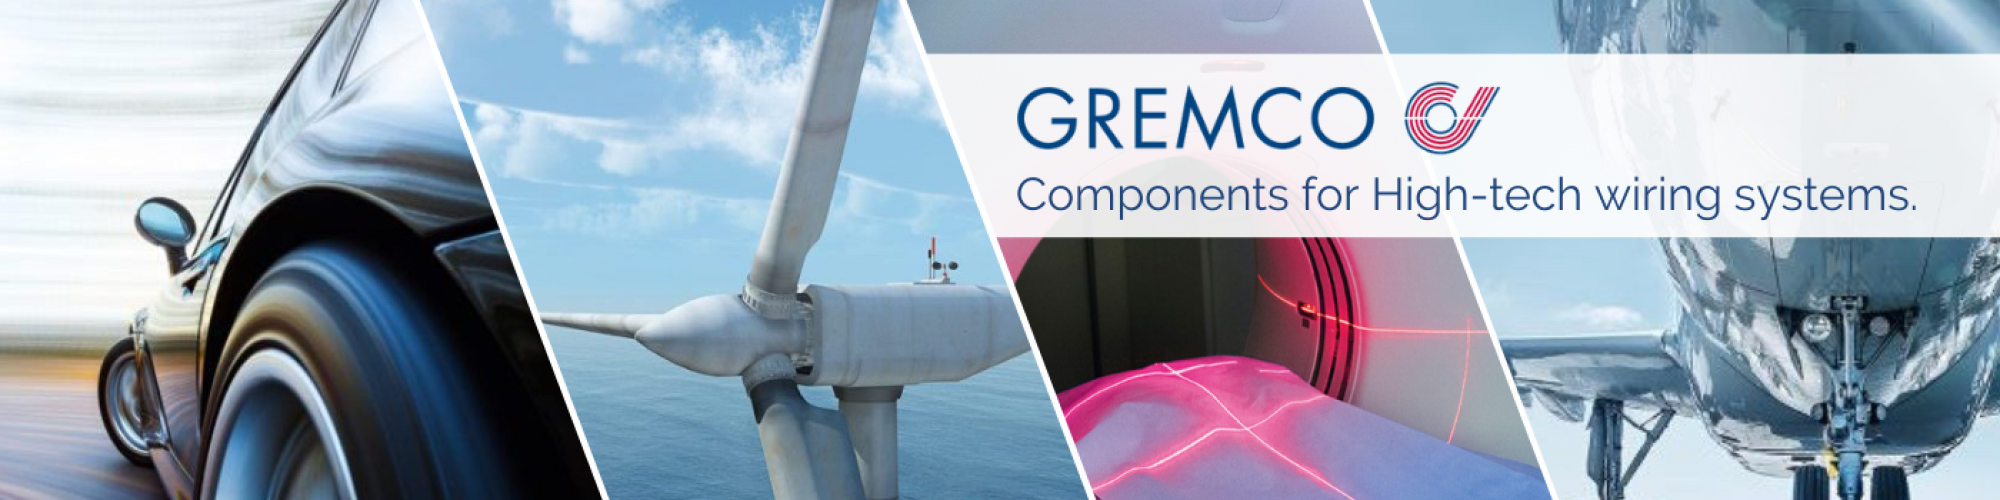 GREMCO GmbH